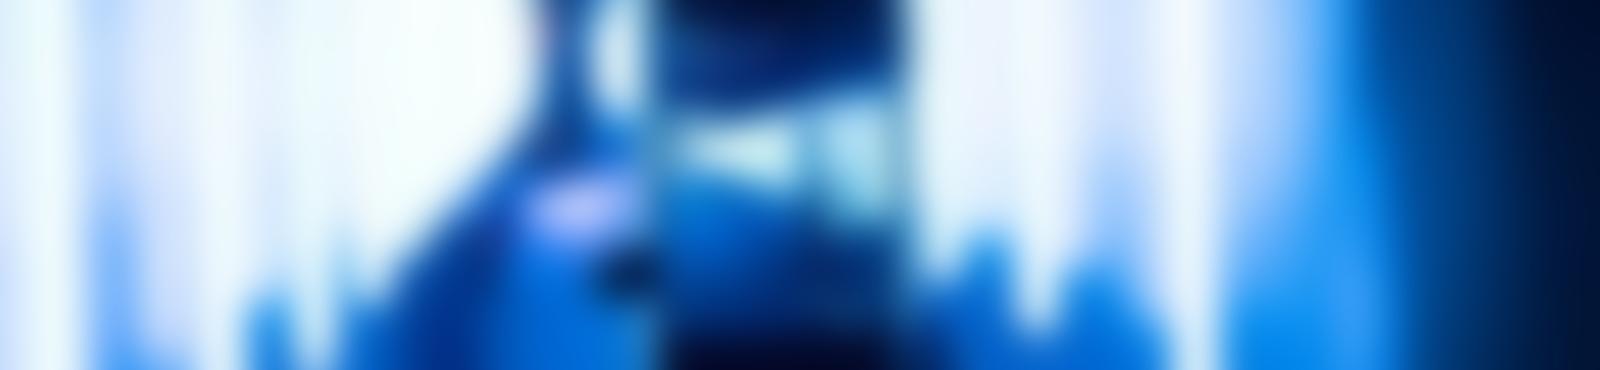 Blurred 3d1ab3dd ea45 420e a9bf e0cc8187d581